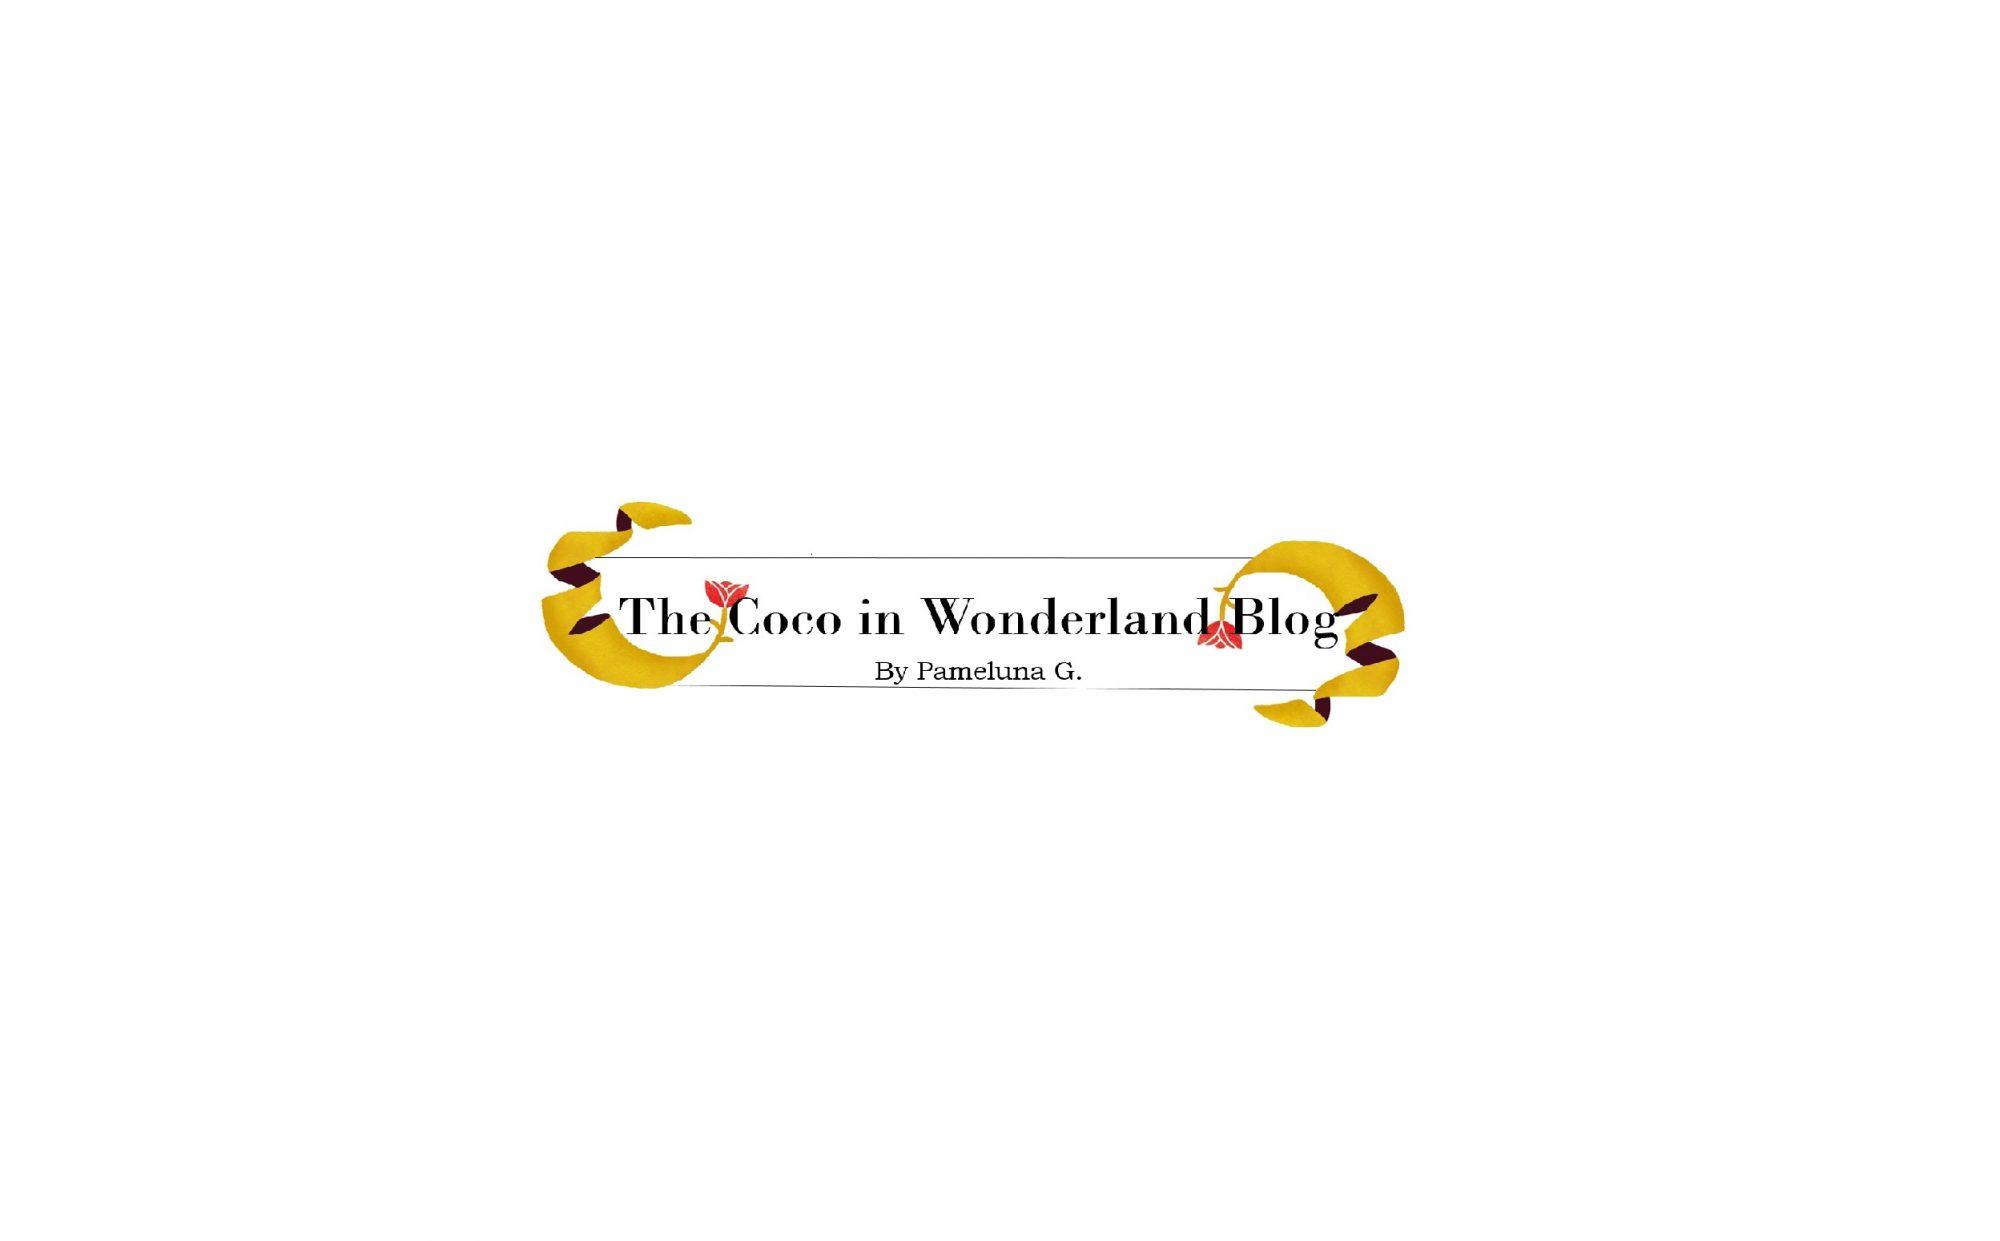 The Coco in Wonderland Blog